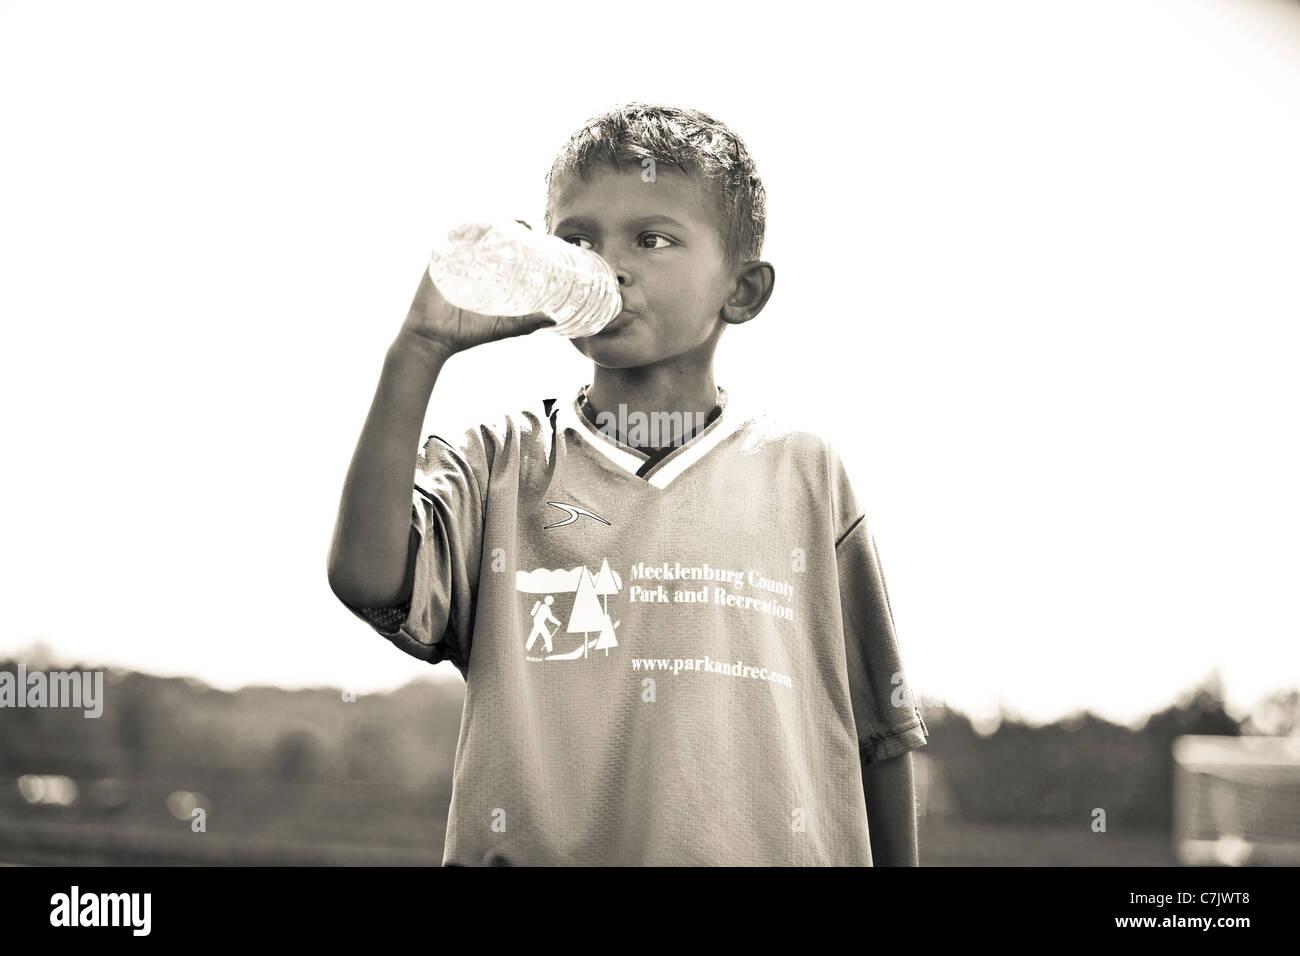 portrait of boy drinking bottled water - Stock Image